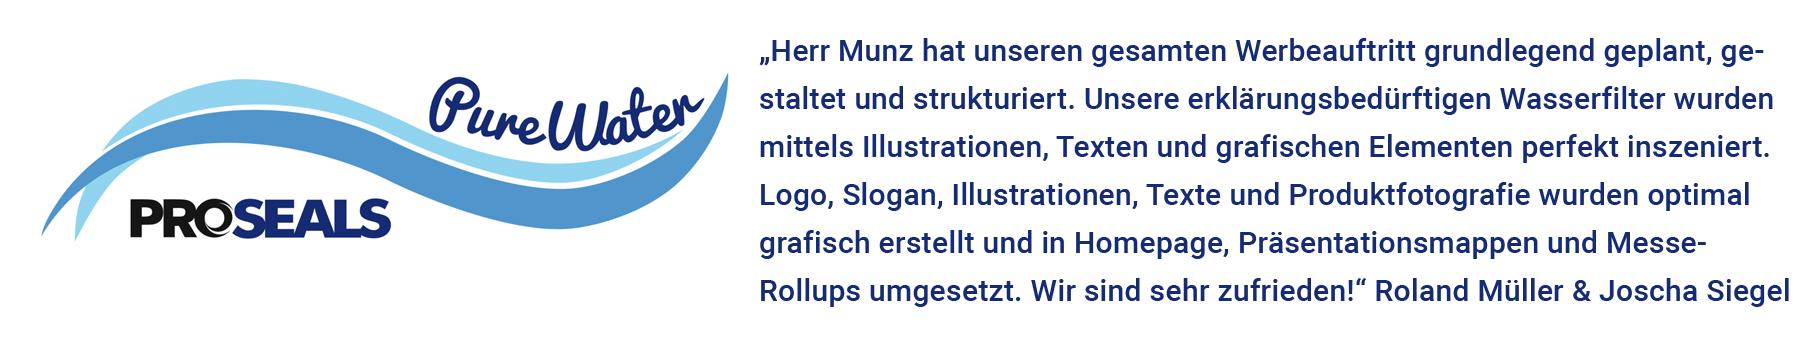 Referenz, Herrn Müller, Proseals-Purewater-Wasserfilter, Backnang